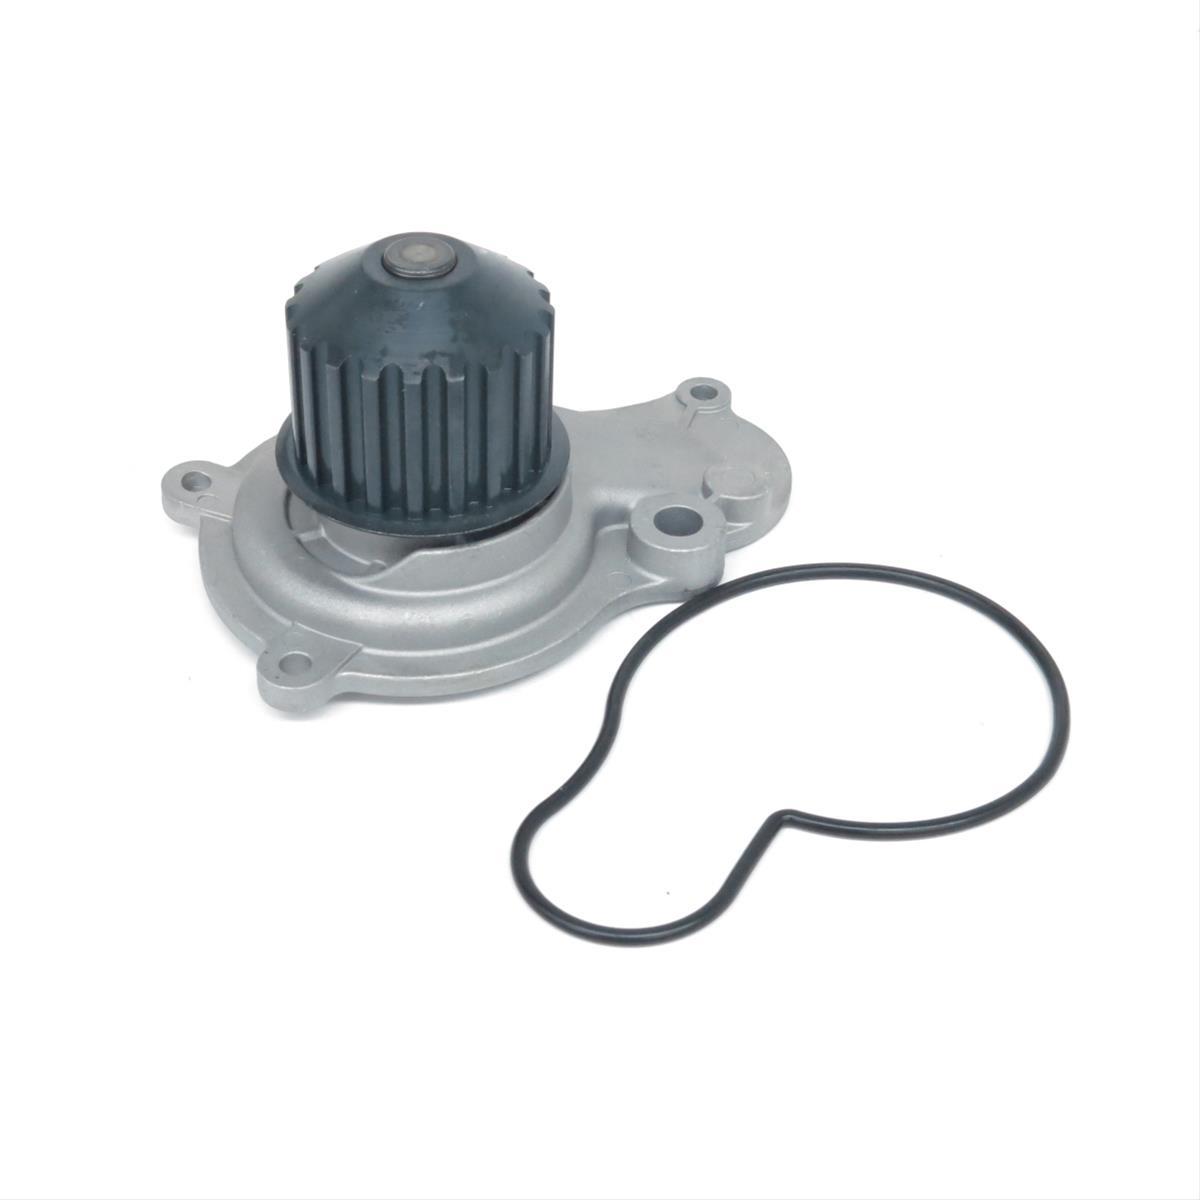 FlowKooler Hi Flow Mechanical Water Pump 1750